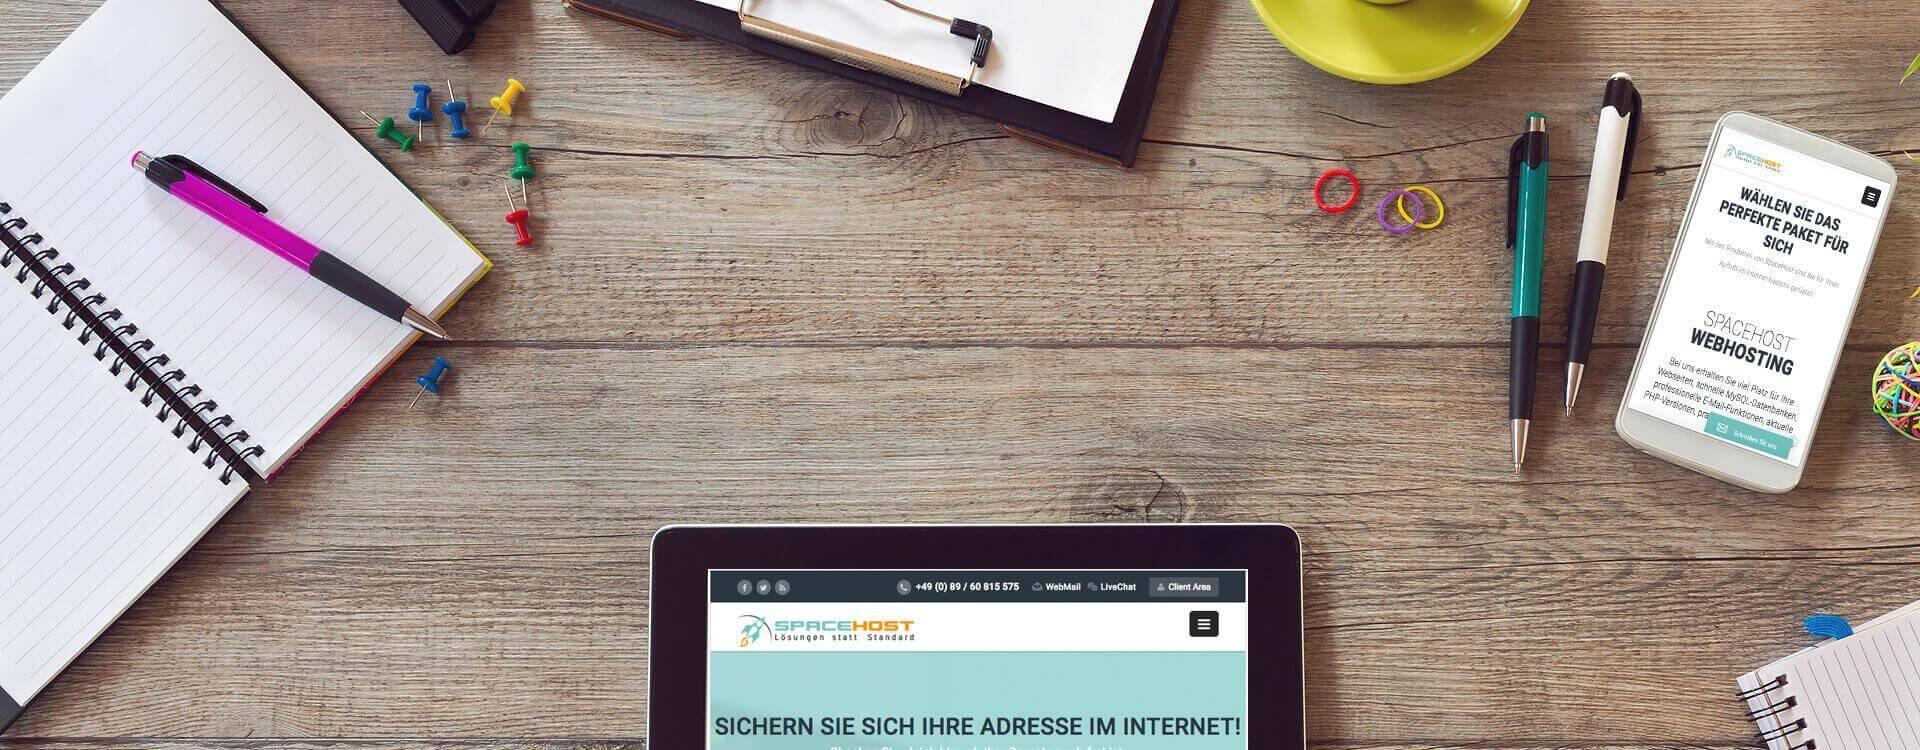 shared-hosting-main-header